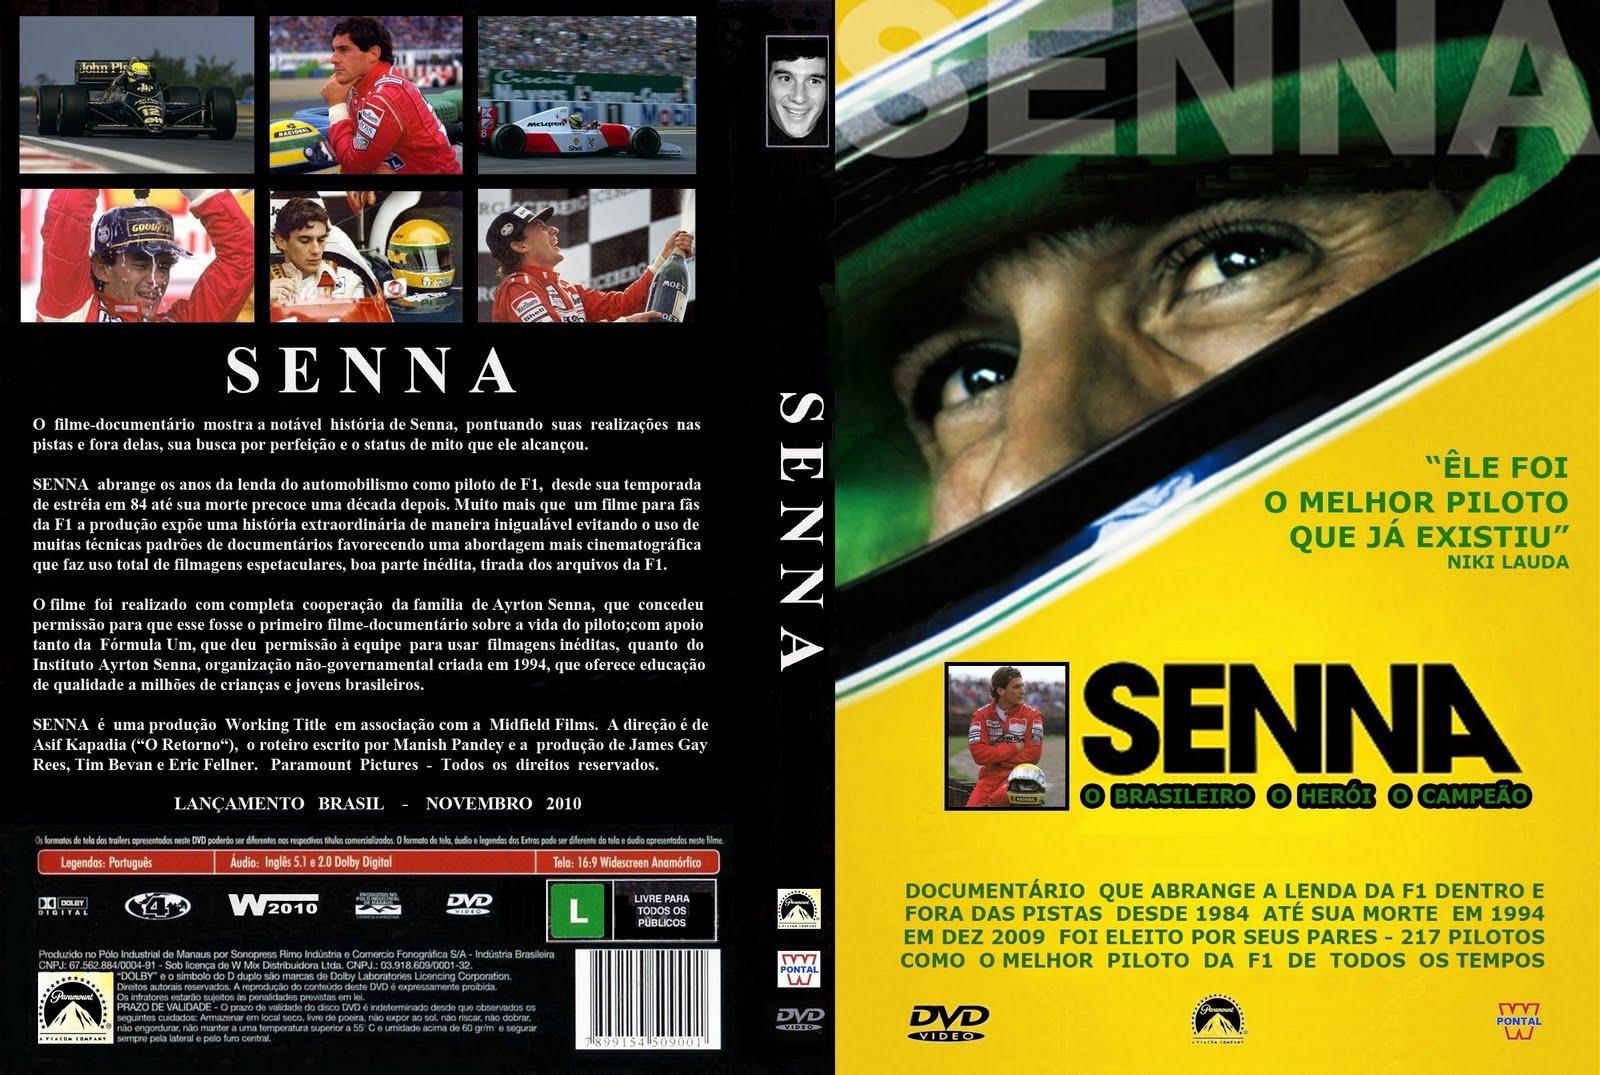 Senna DVDRip XviD Dual Áudio Senna